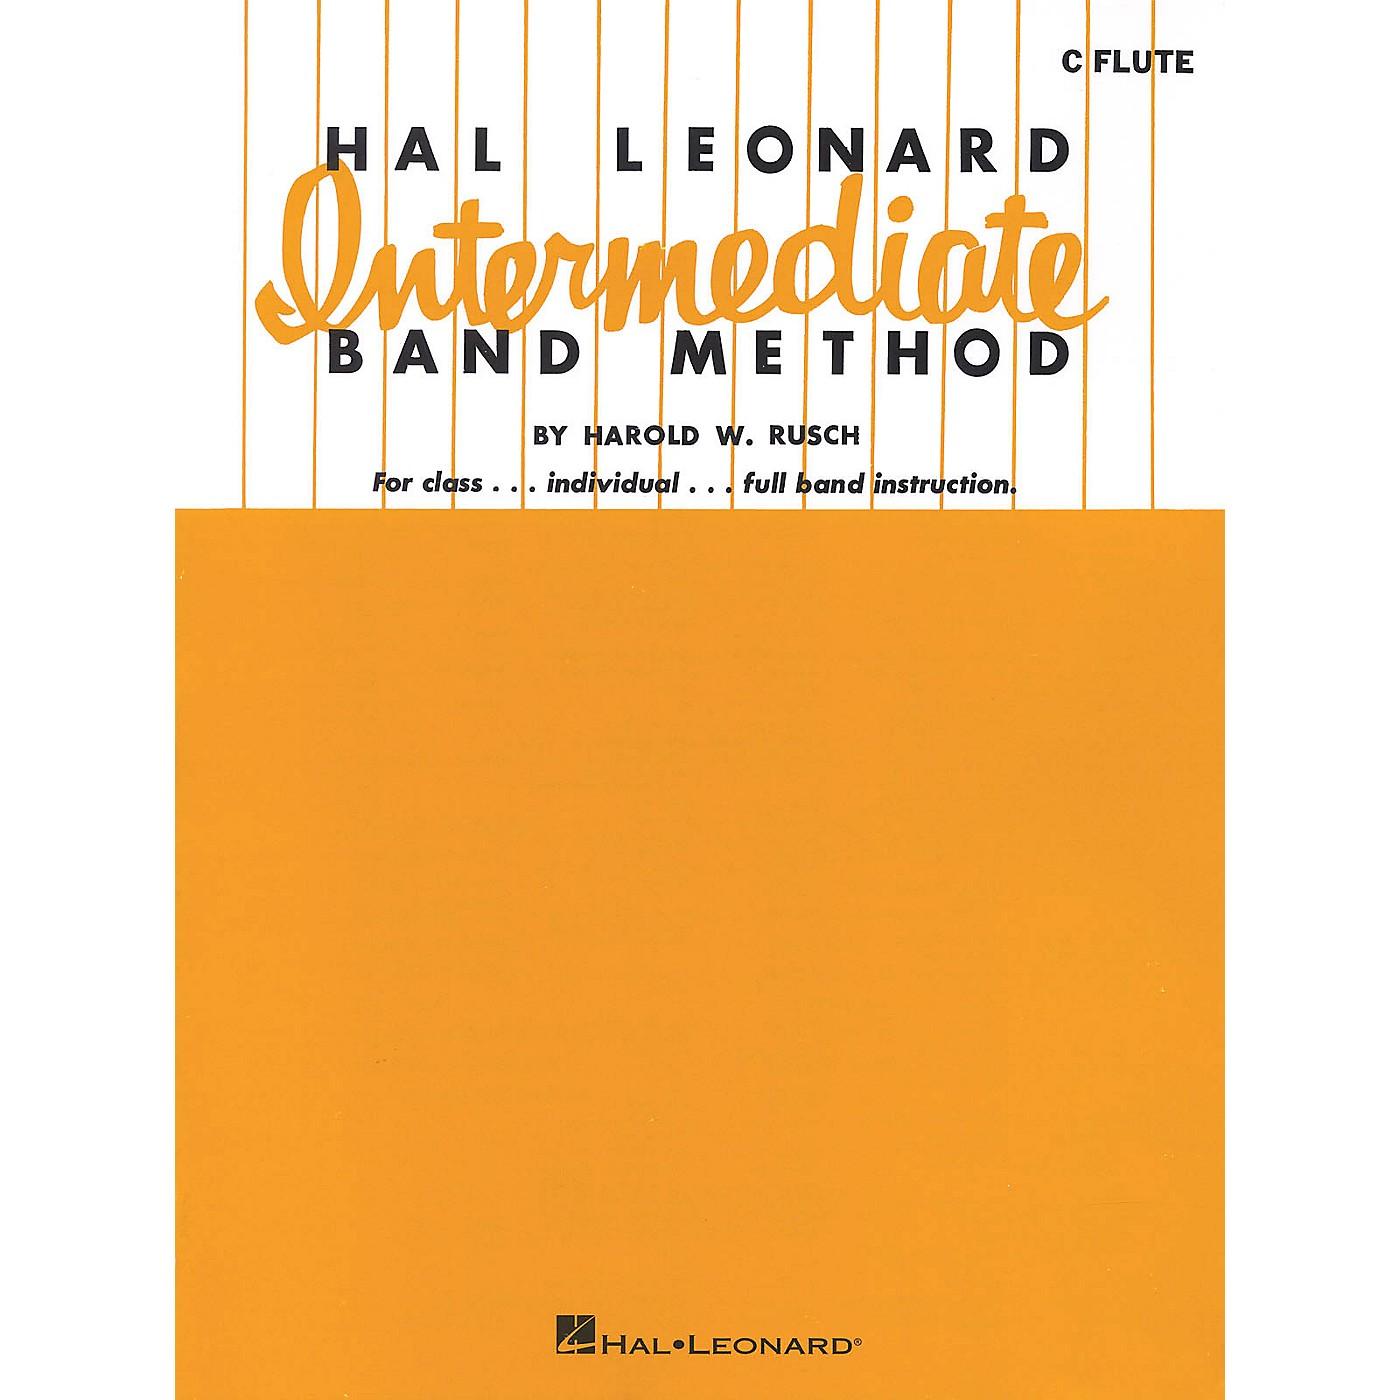 Hal Leonard Hal Leonard Intermediate Band Method (Baritone B.C.) Intermediate Band Method Series thumbnail